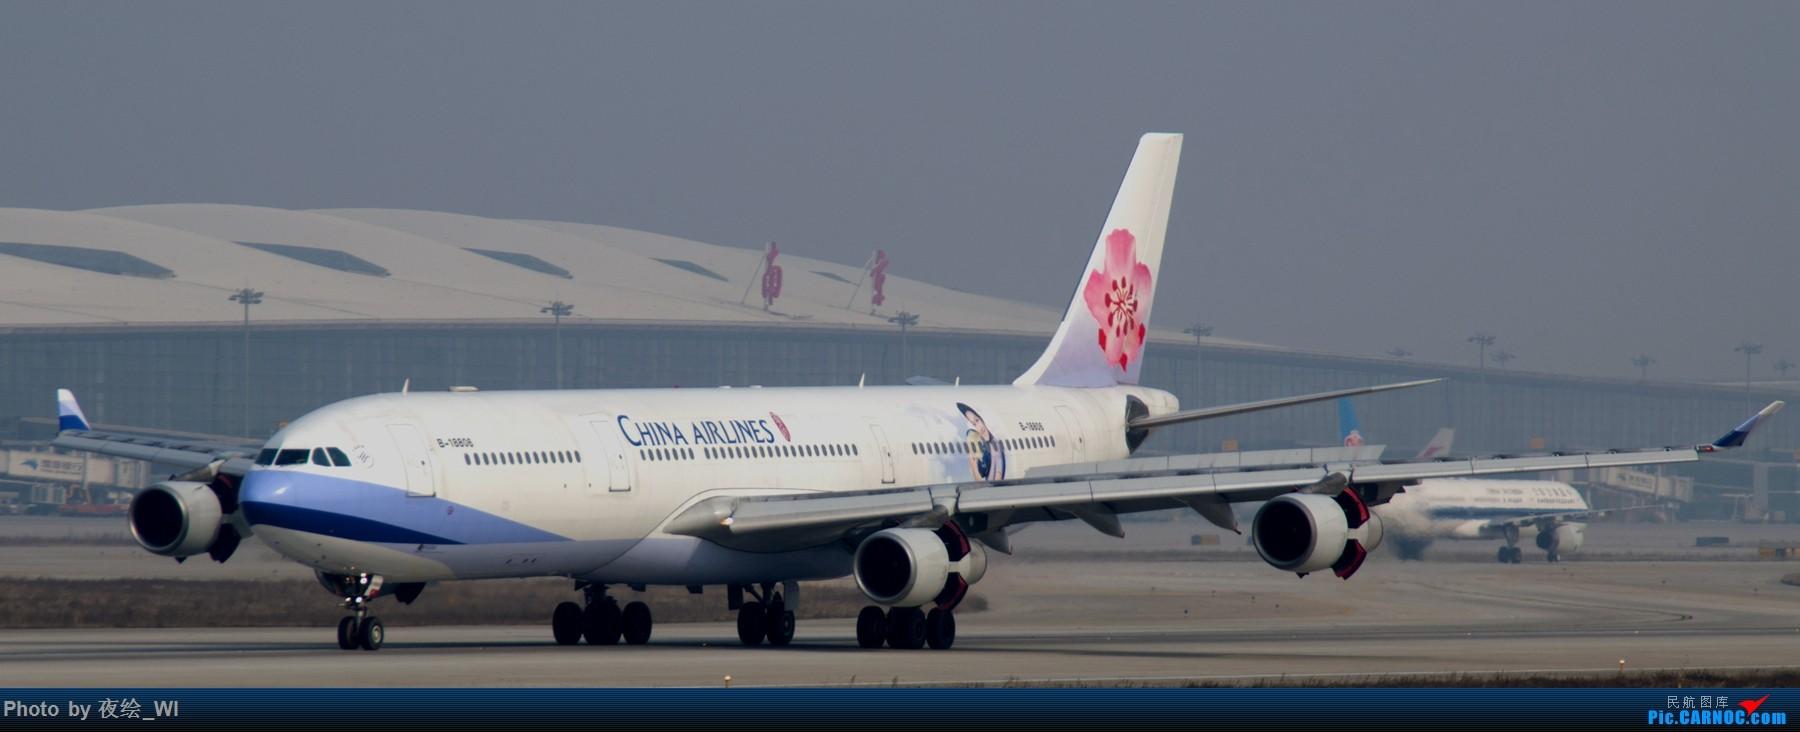 Re:[原创]NKG,2016新年第一拍,邮航734及众多彩绘 AIRBUS A340-300 B-18806 中国南京禄口国际机场